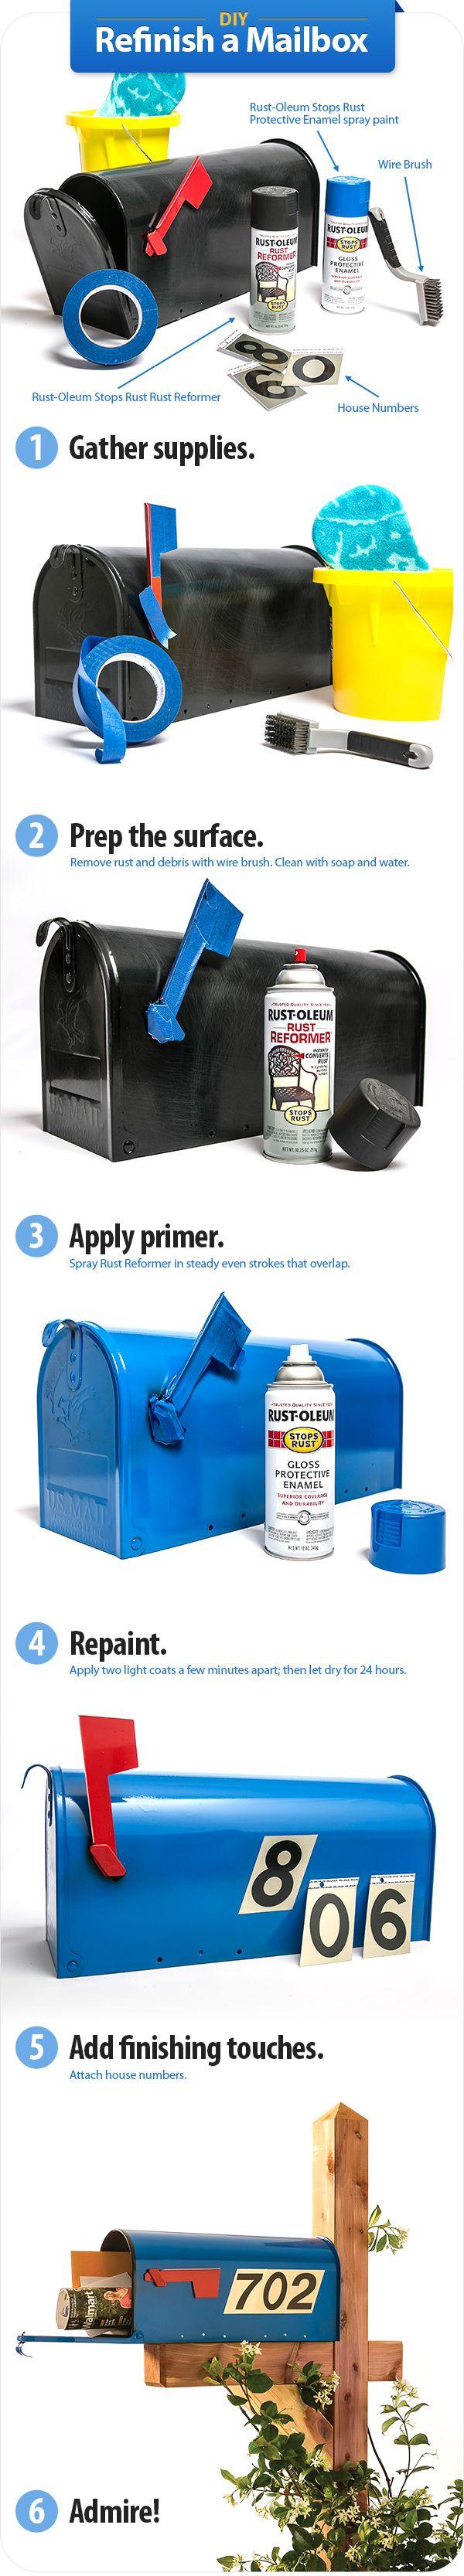 DIY: Refinish a Mailbox